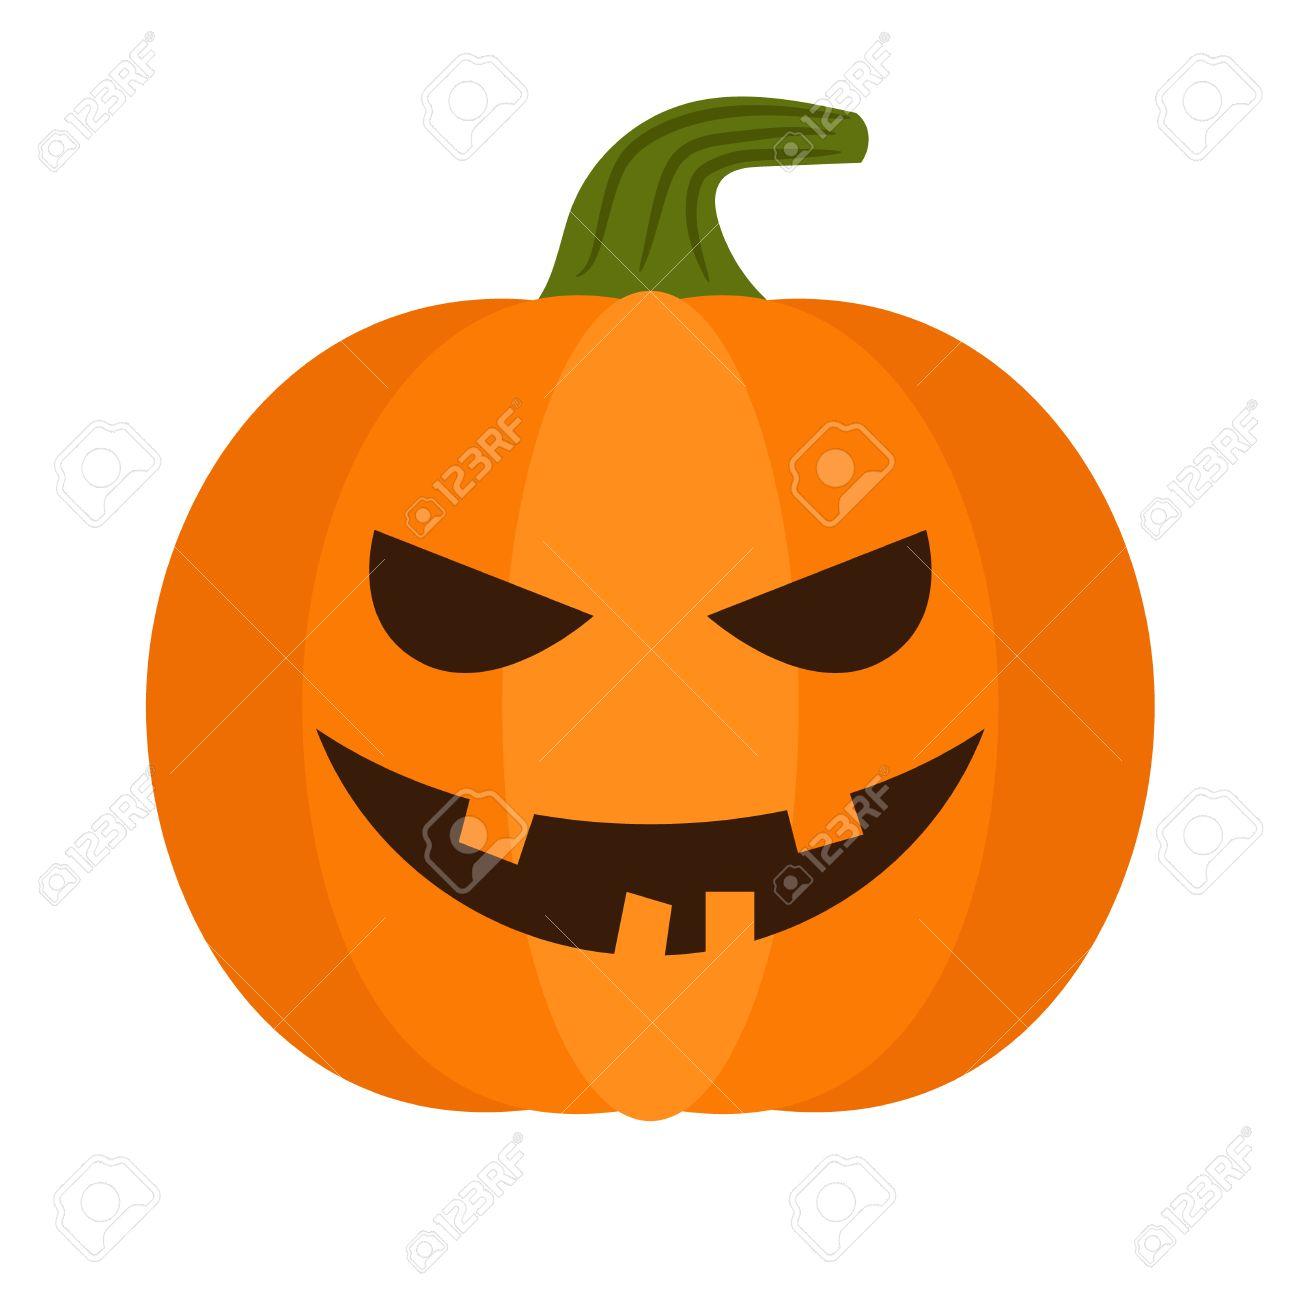 Halloween Pumpkin Vector.Cartoon Halloween Pumpkin Vector Pumpkin With Sinister Smiling